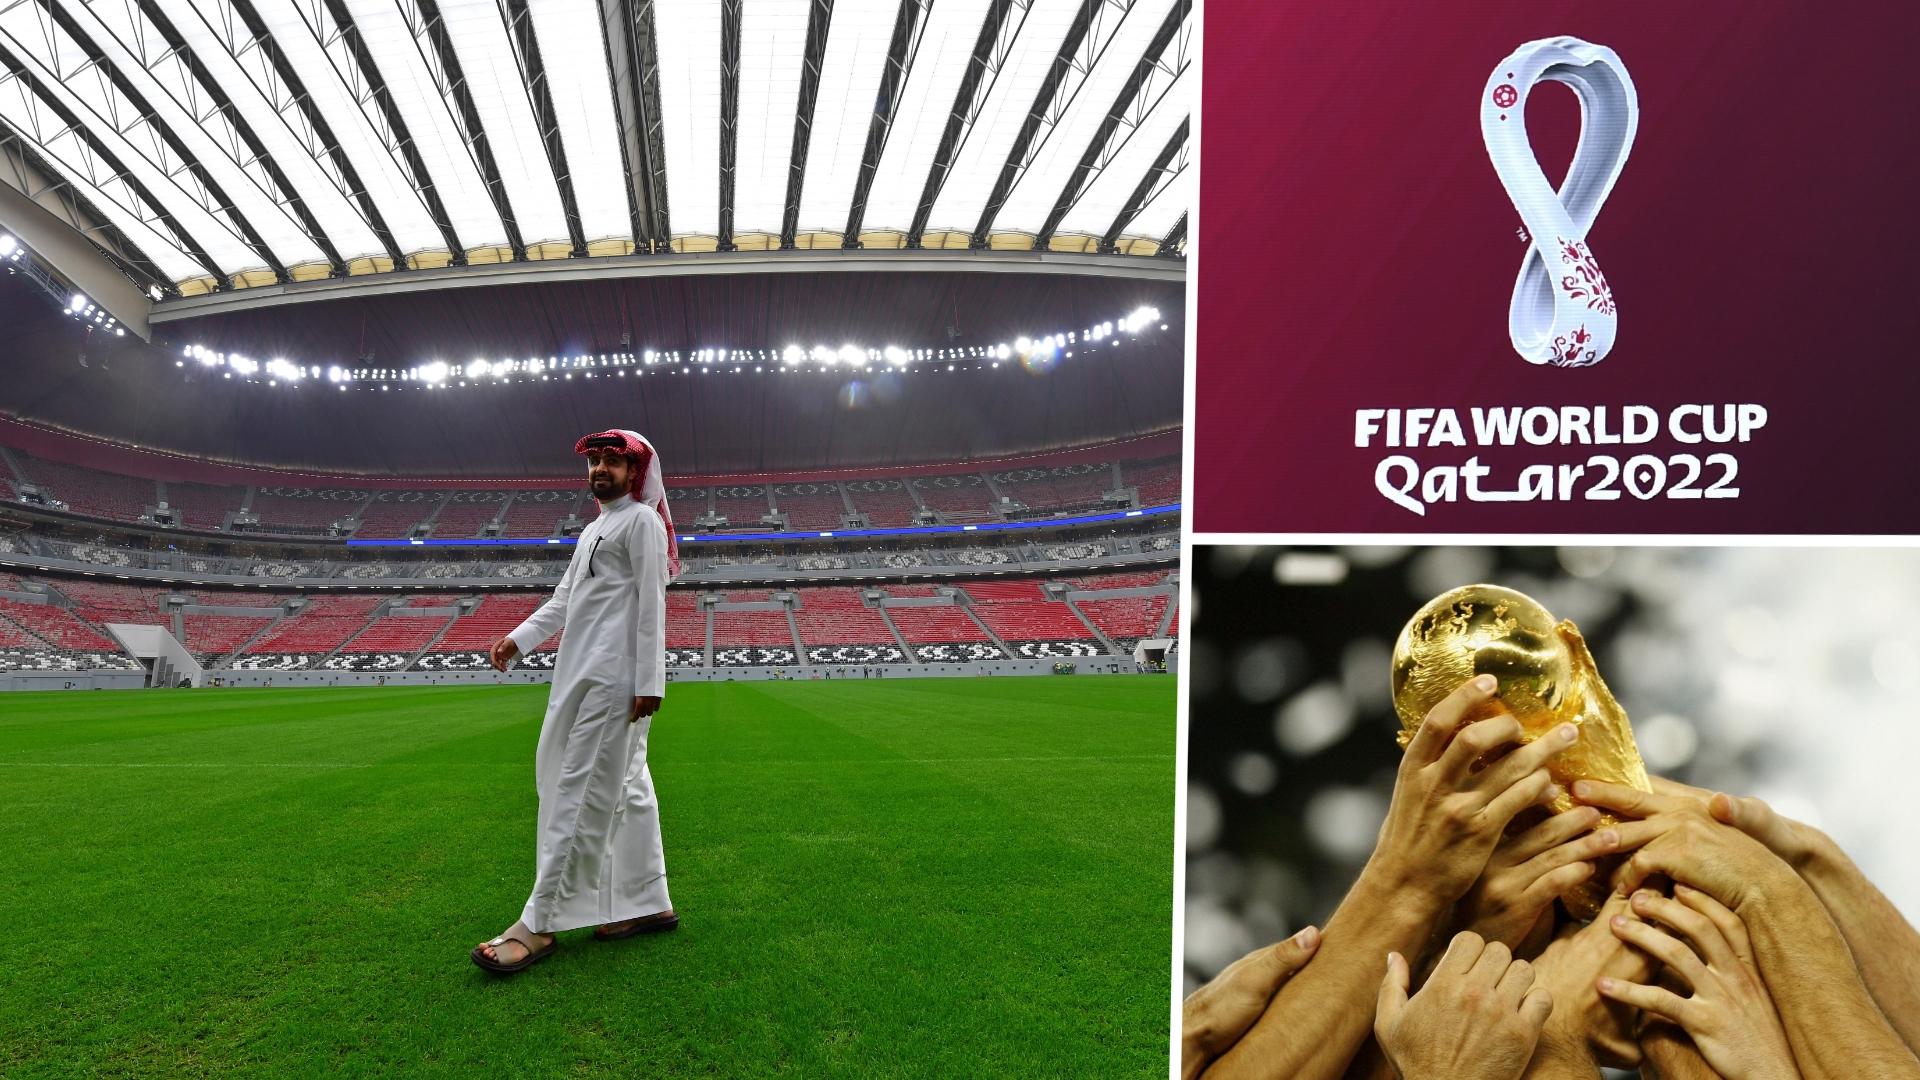 World Cup schedule announced by Federation Internationale de Football Association